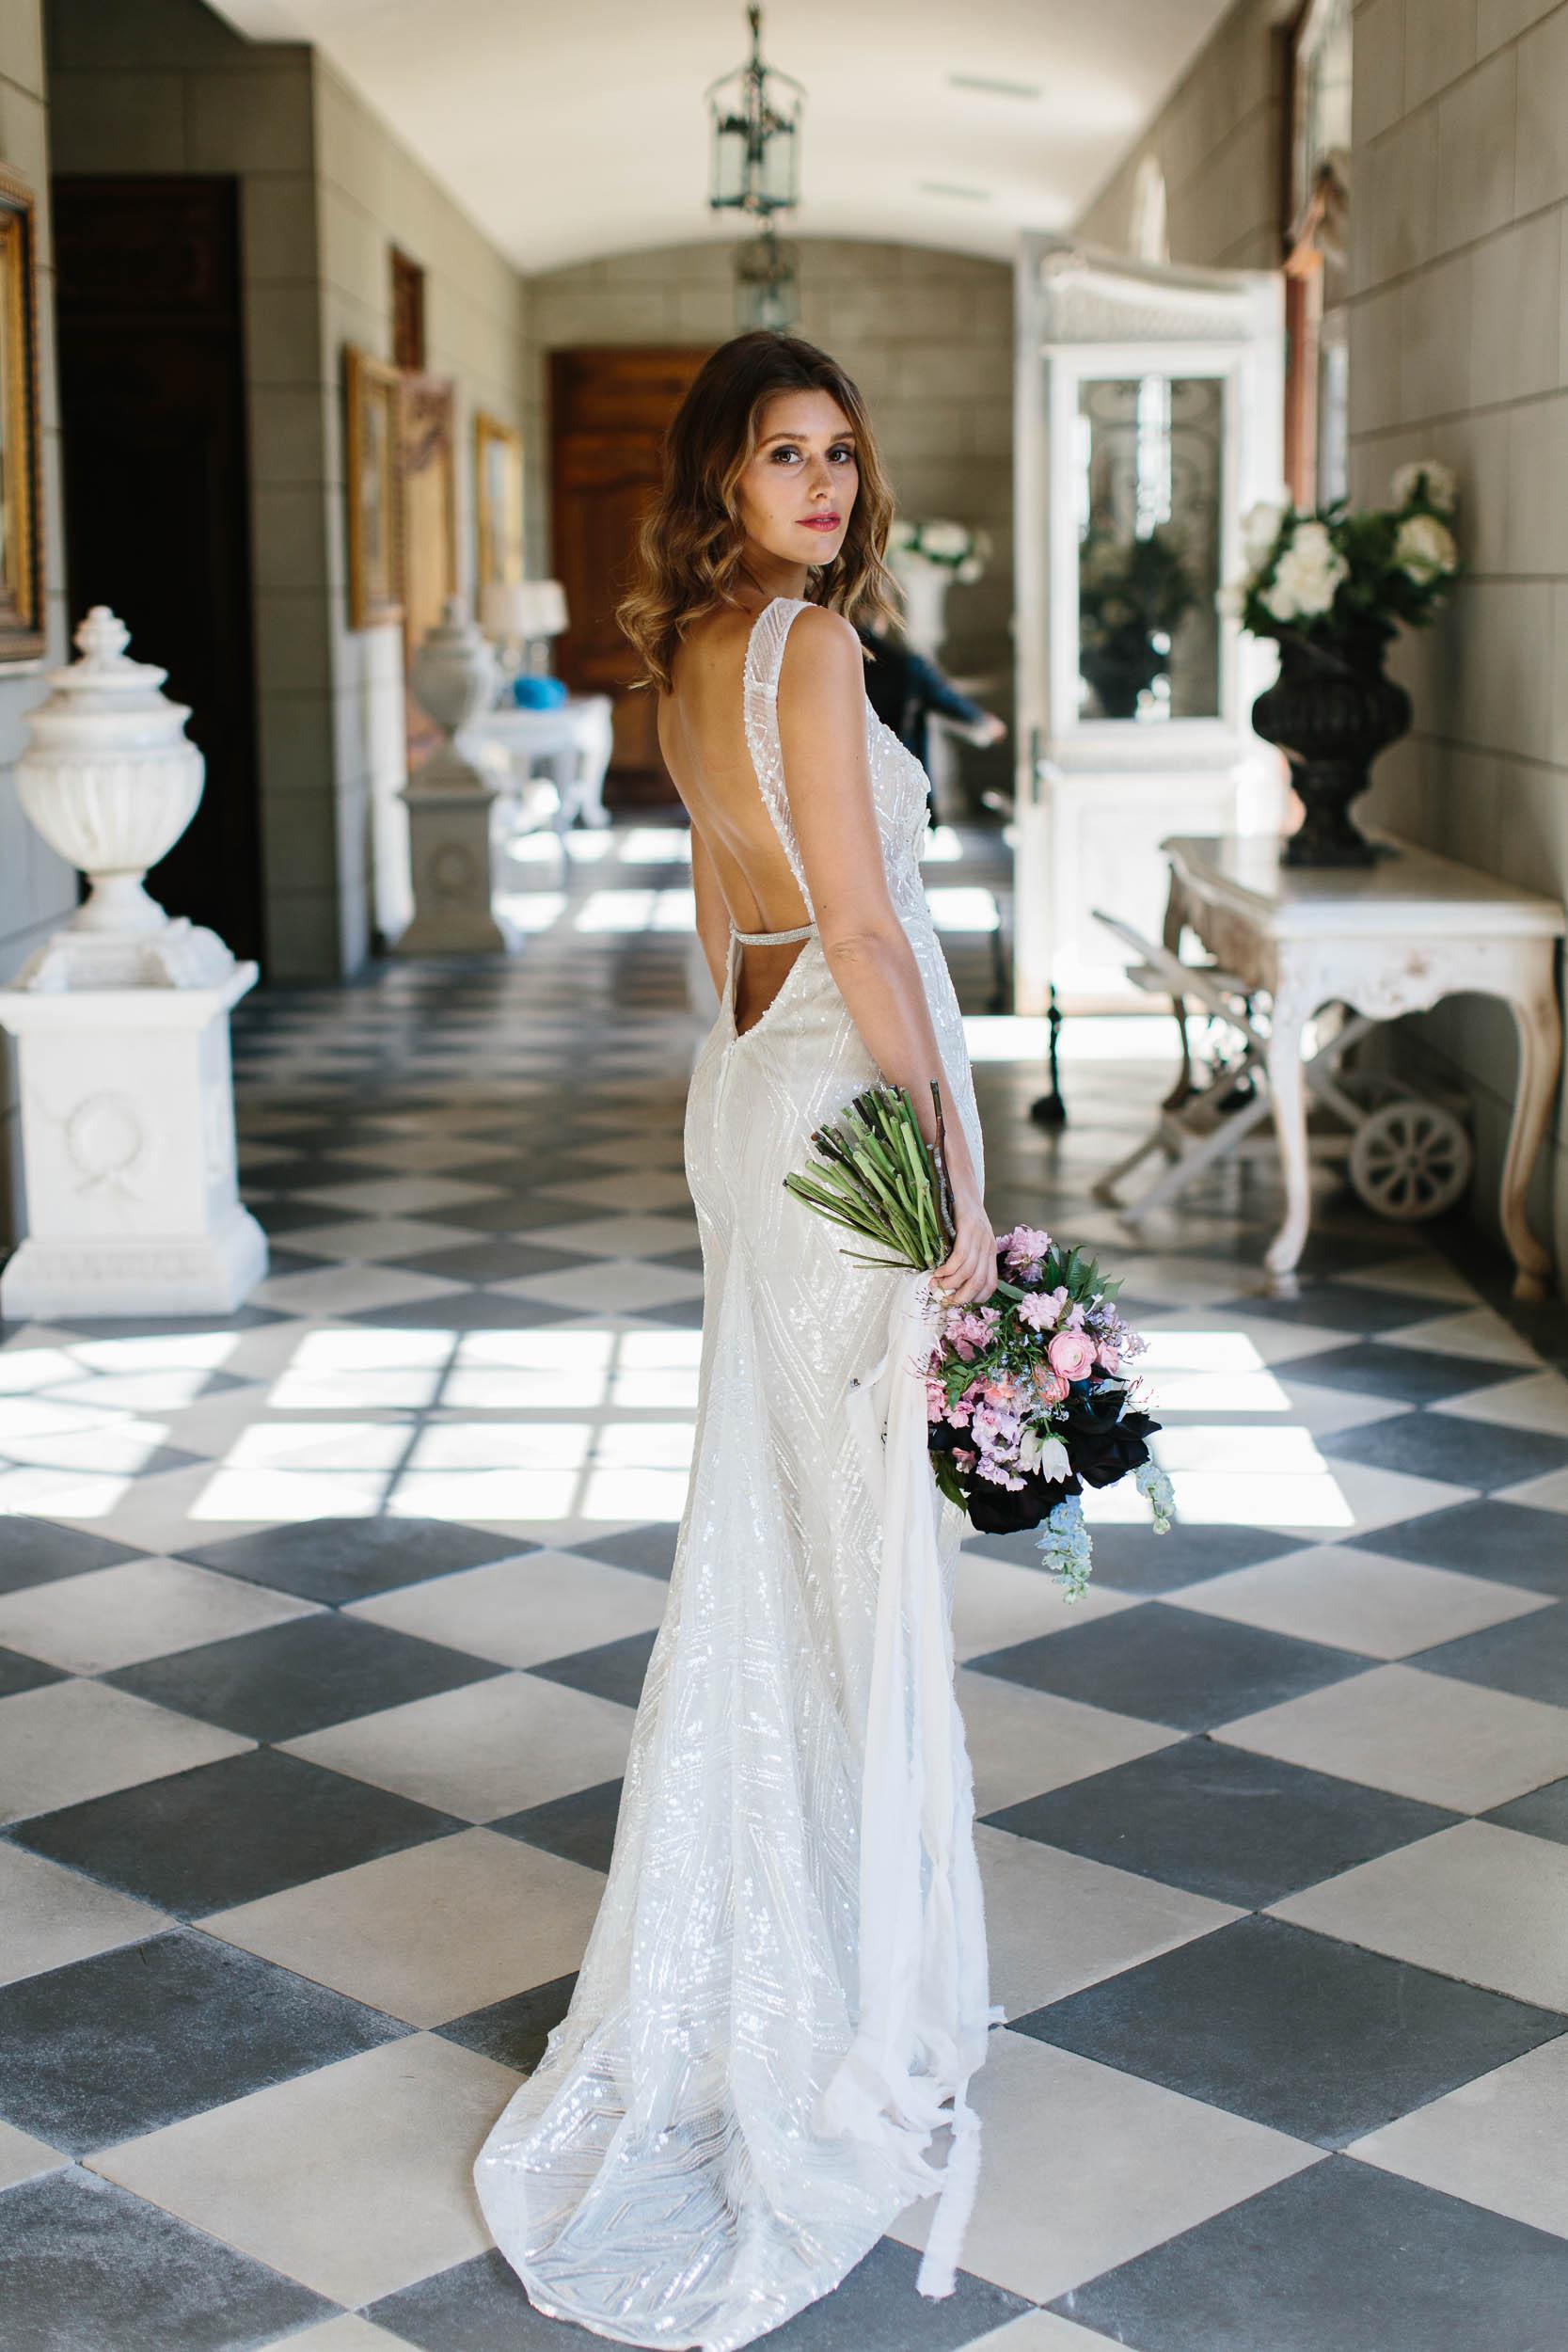 Low Back Beaded Berta Wedding Dress | Wedding Photography by Kas Richards